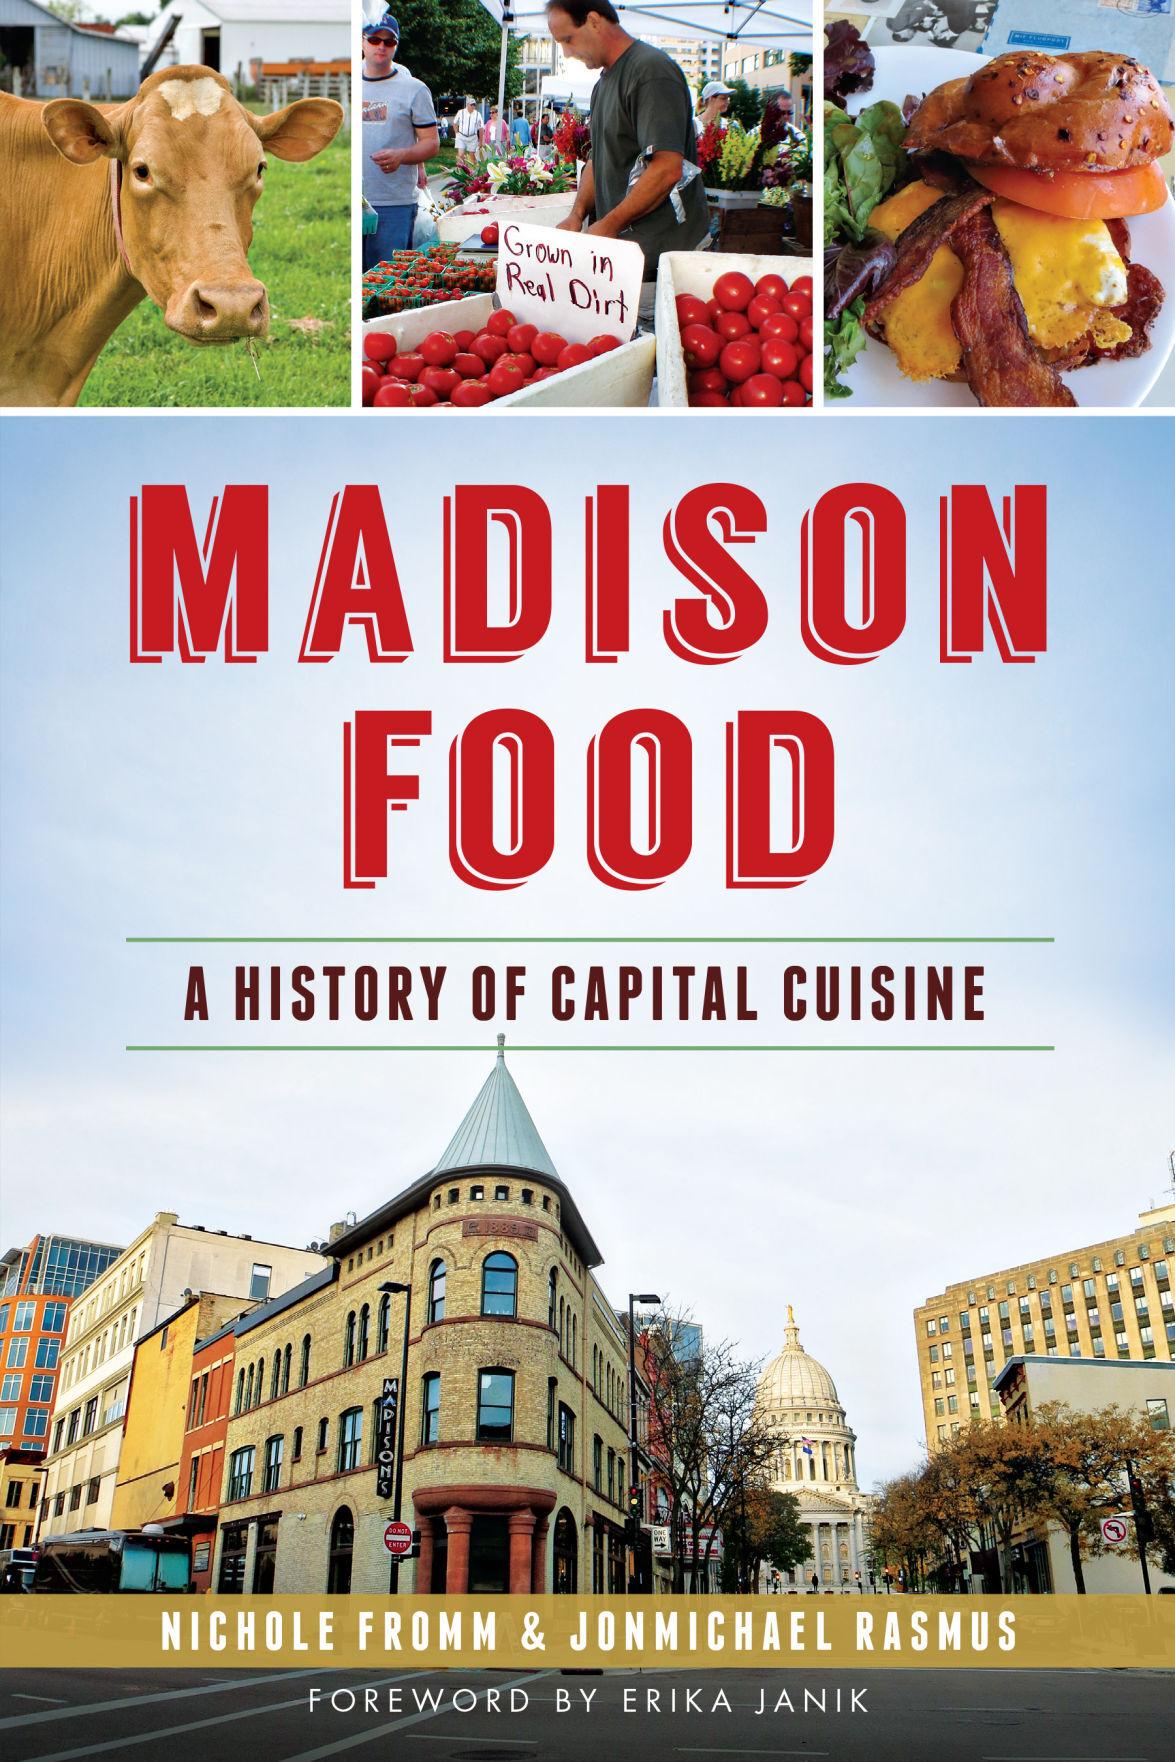 Madison Food: A History of Capital Cuisine (copy)